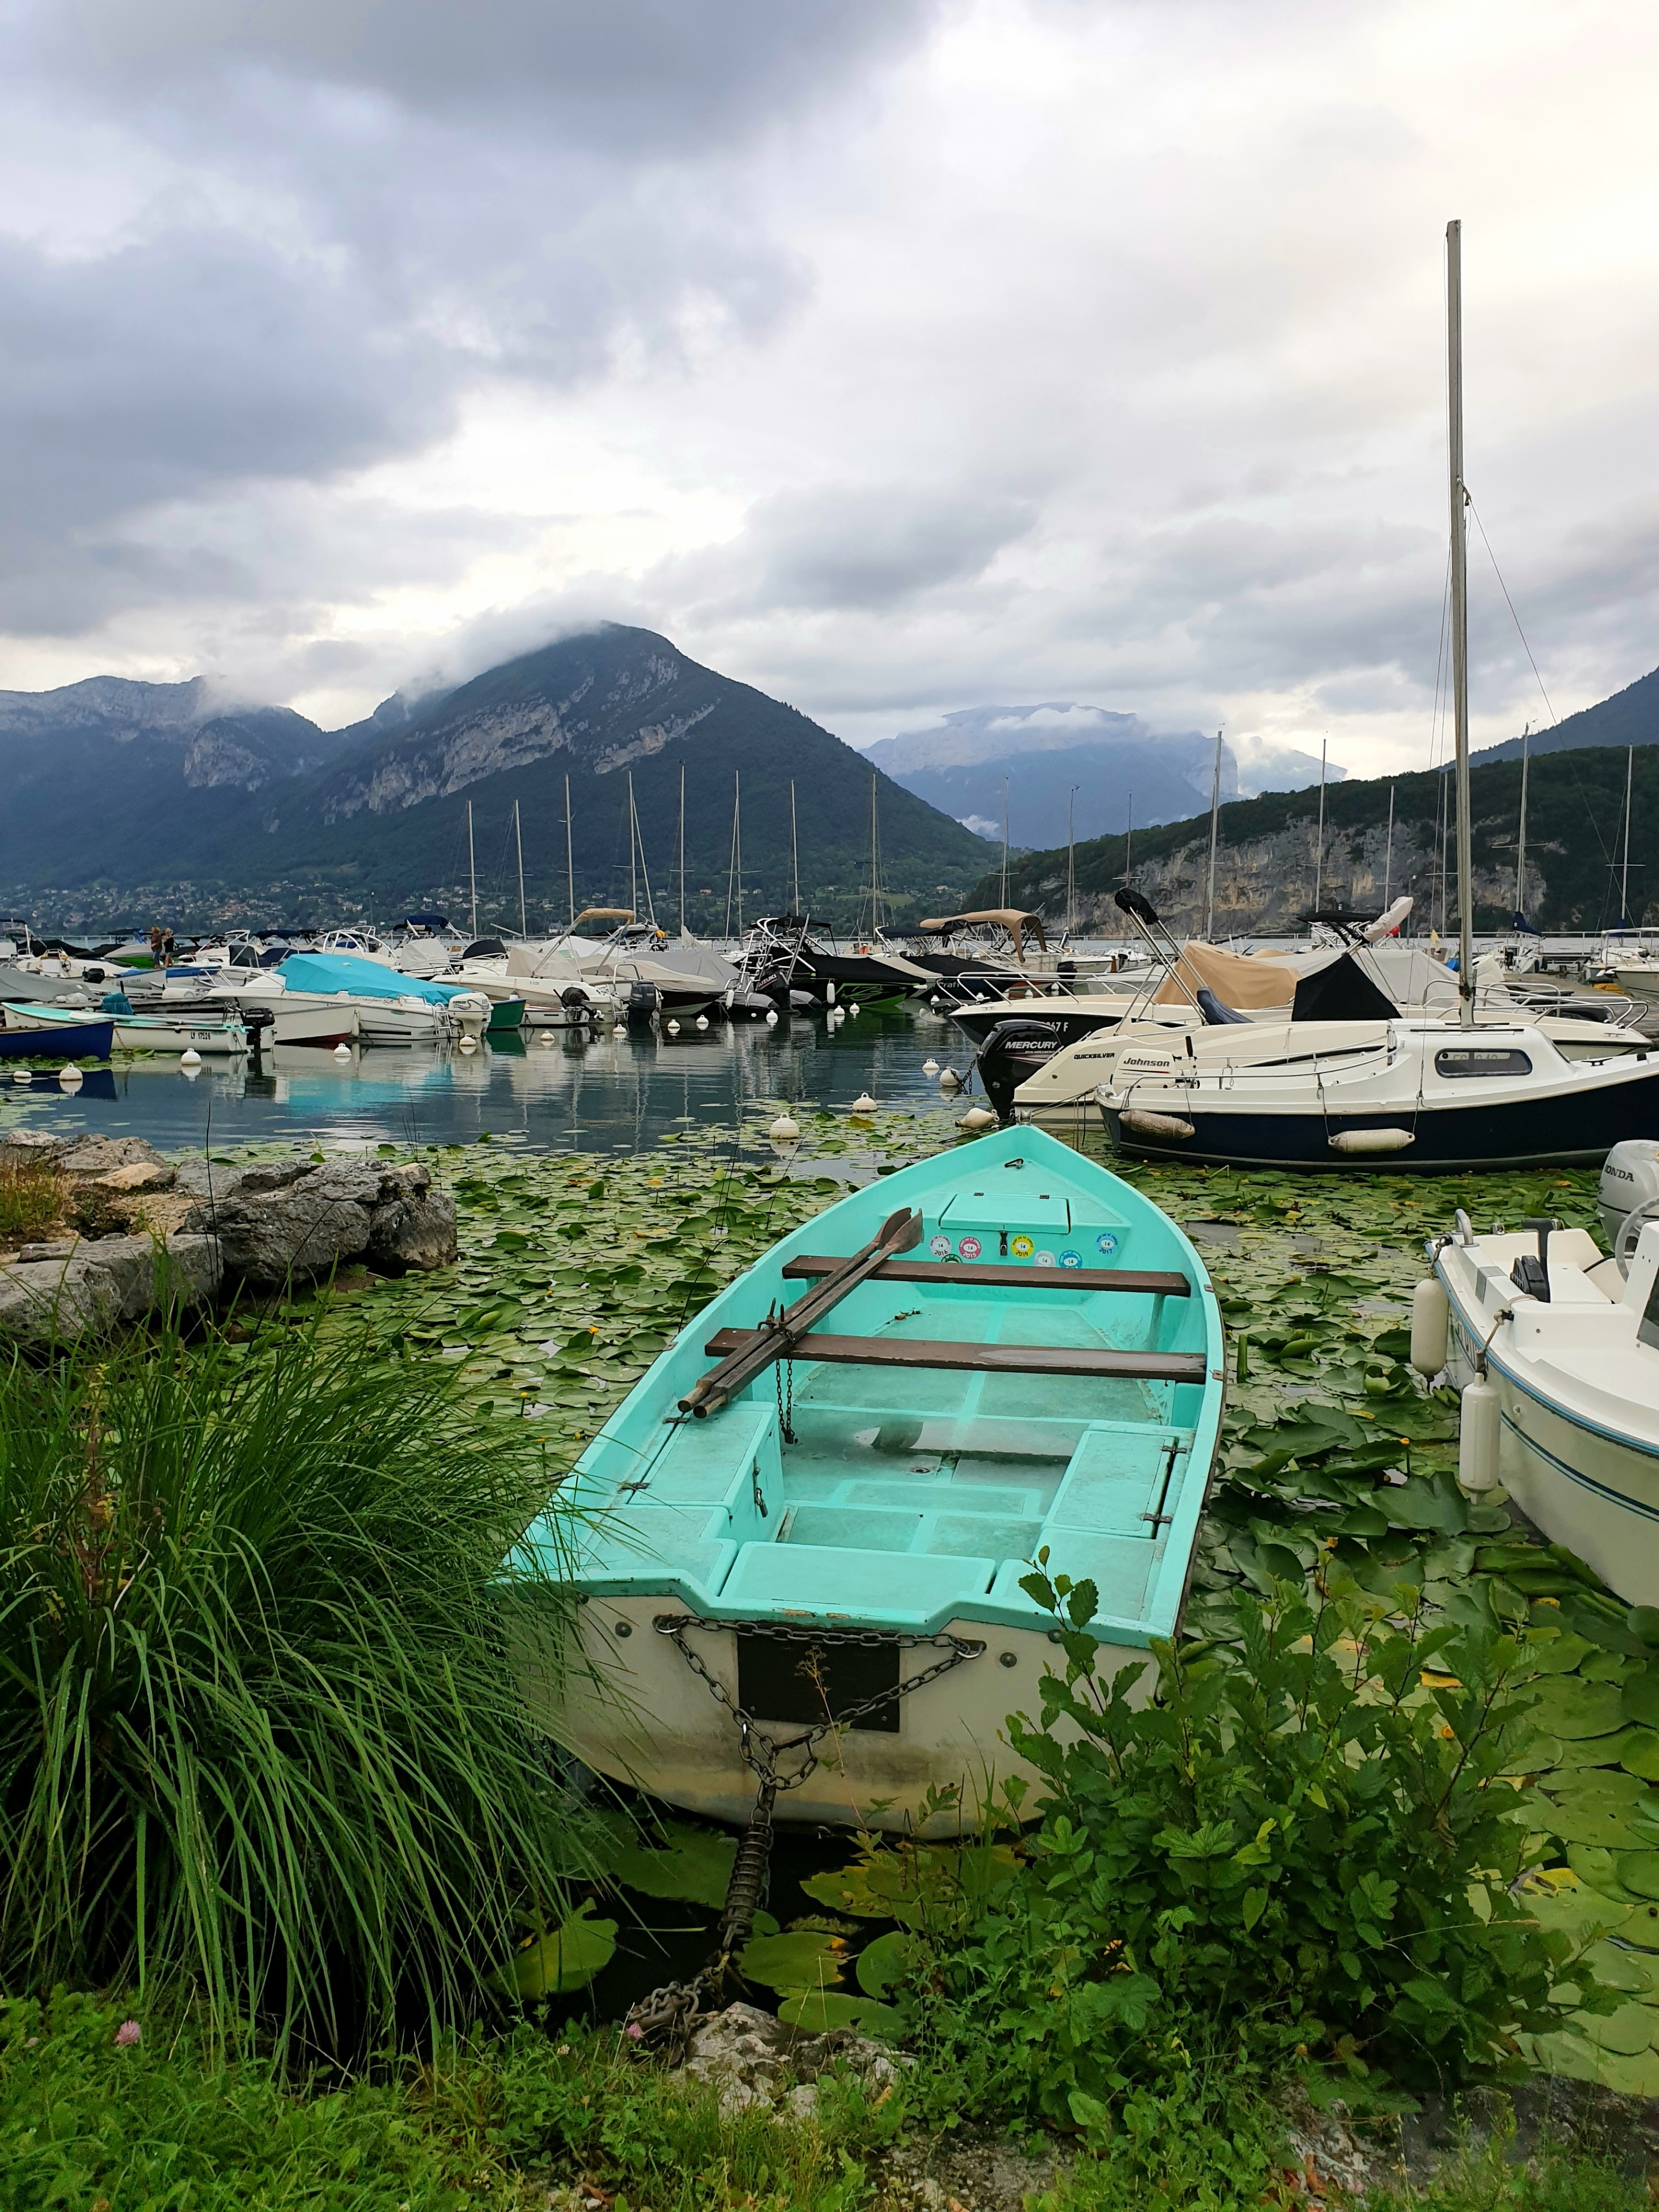 Saint-Jorioz, Haute-Savoie, France